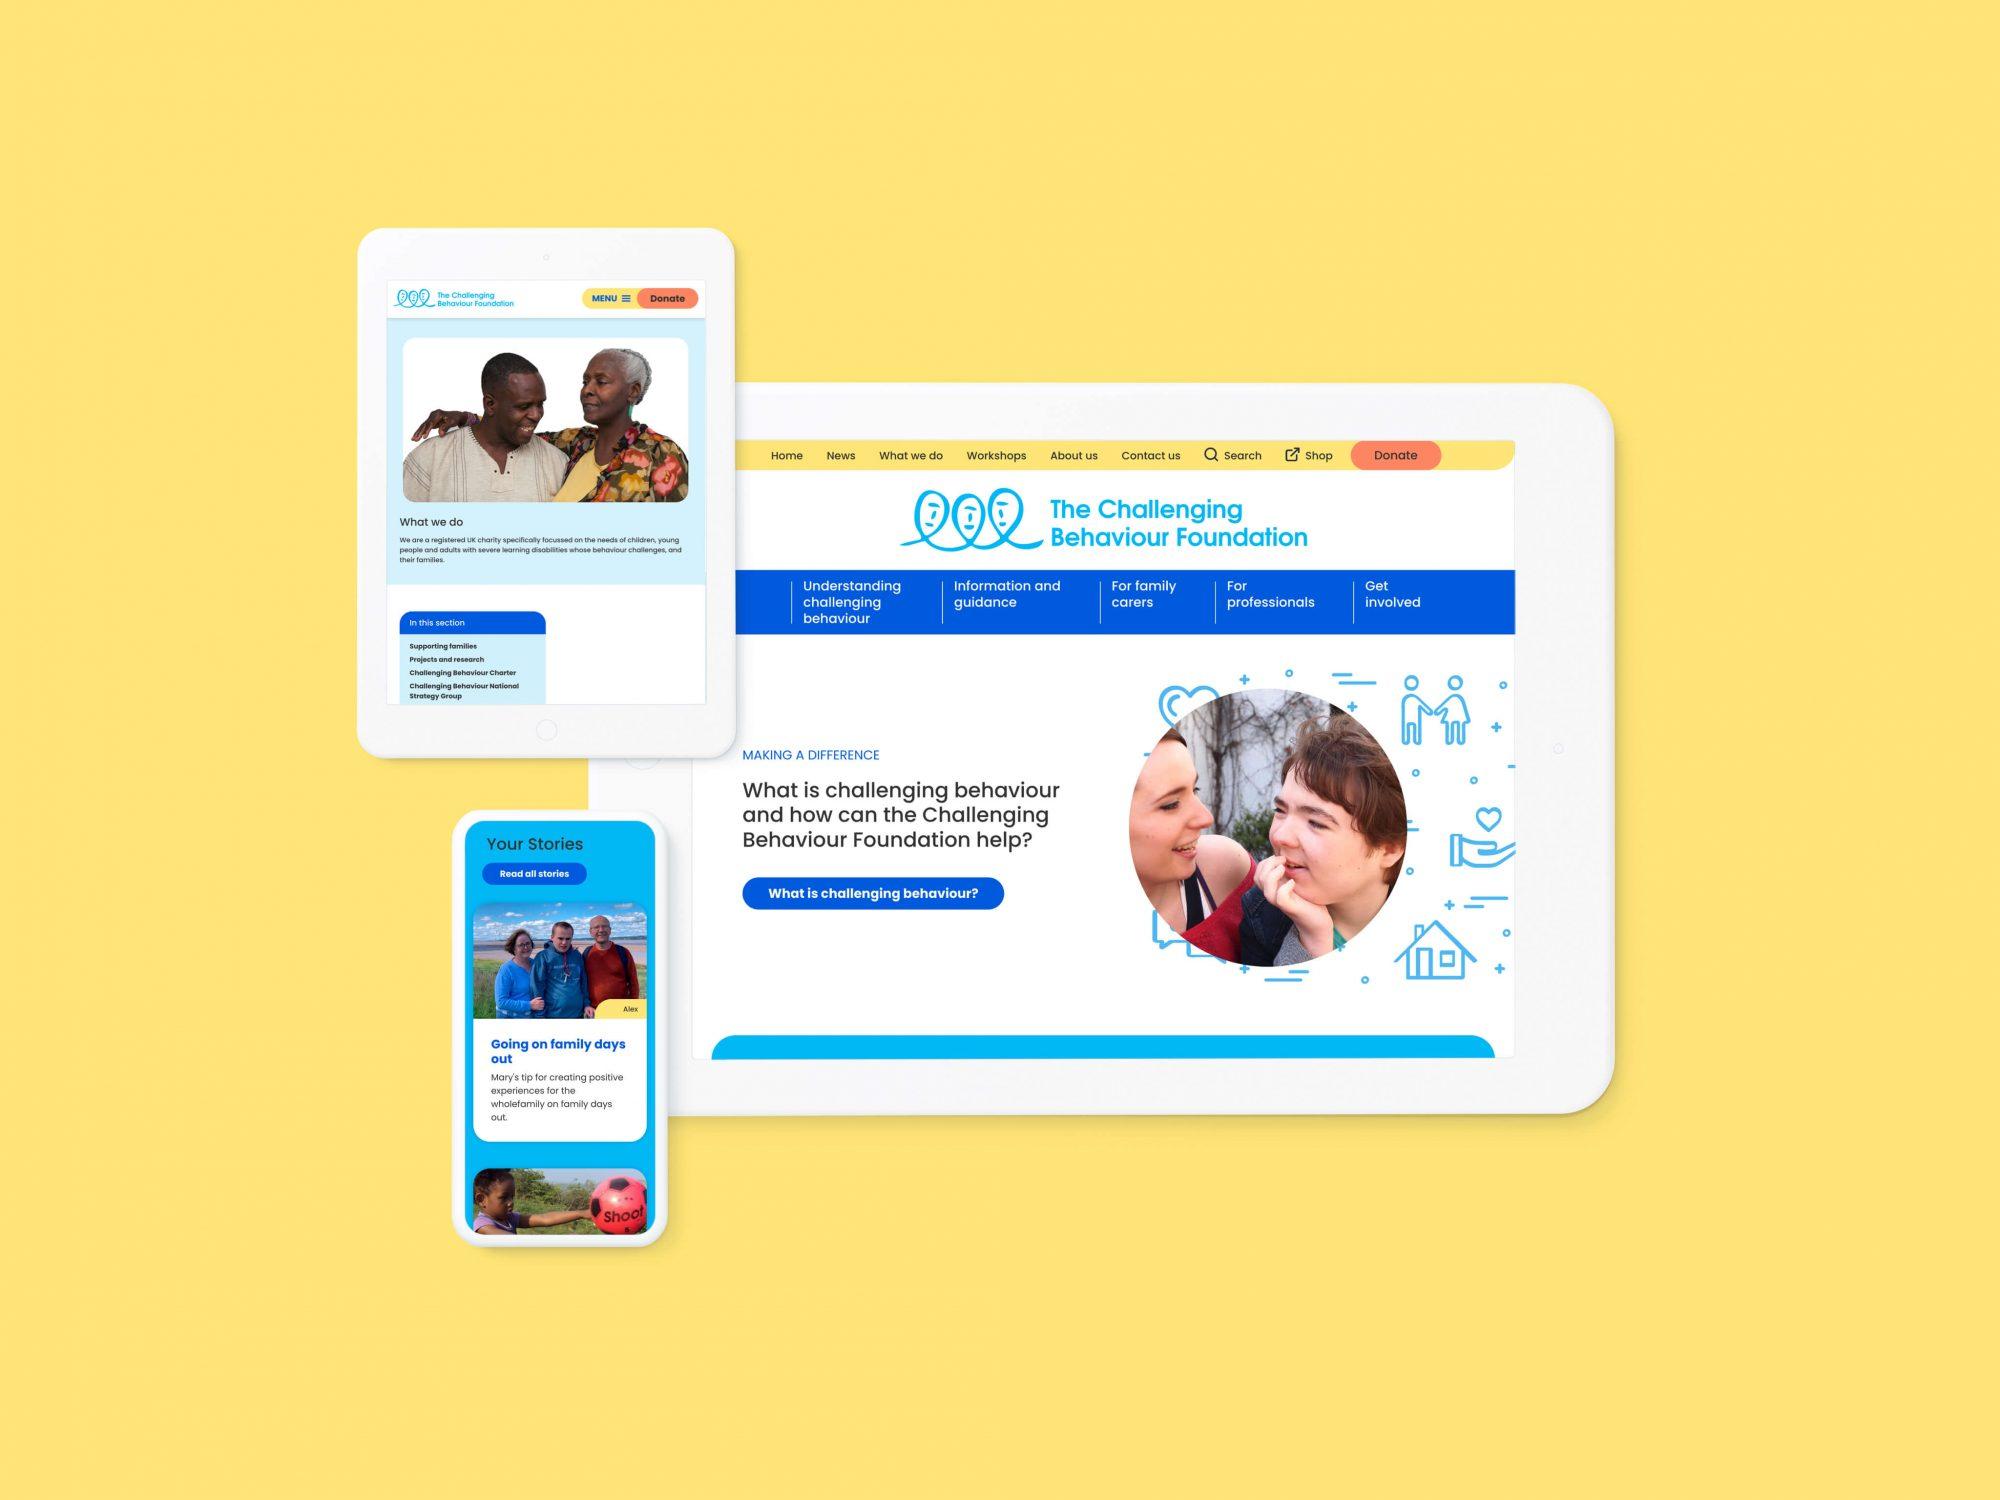 Website design of the new Challenging Behaviour Foundation website